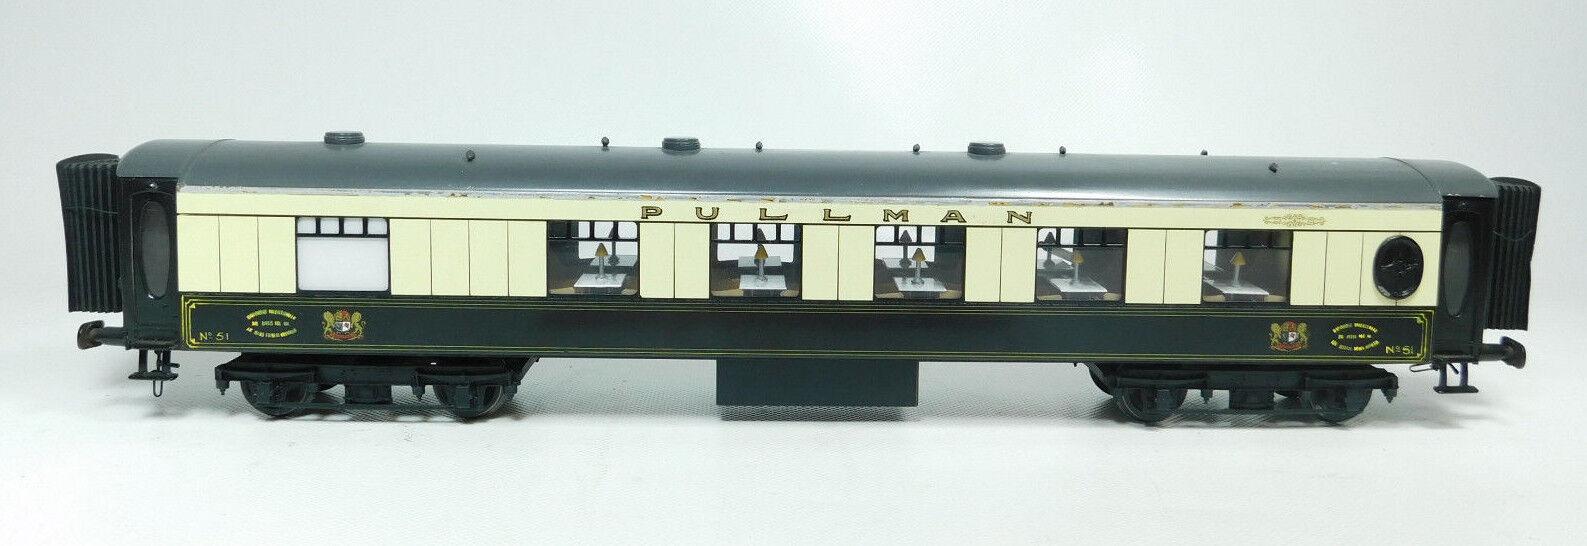 BI667-2   Fulgurex Escala 0   Dc Vagón de Pasajeros Lata Pullman N º 51 Tope